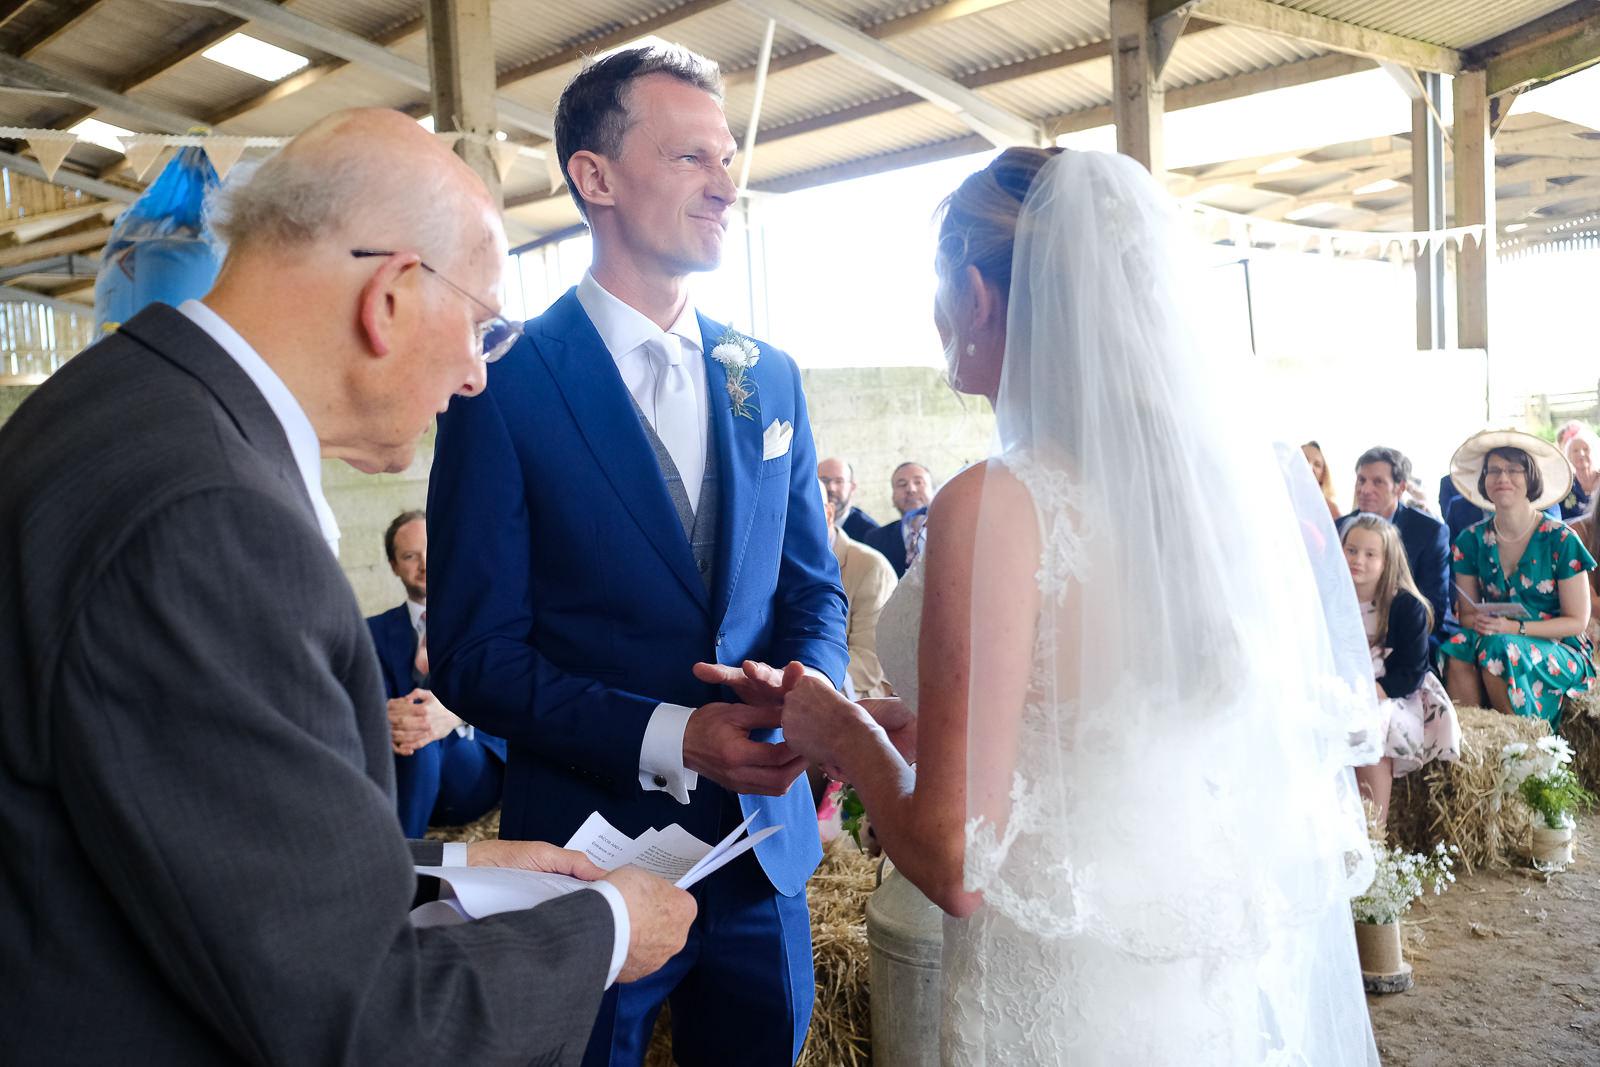 Roscarrock Farm wedding in Cornwall 032.jpg